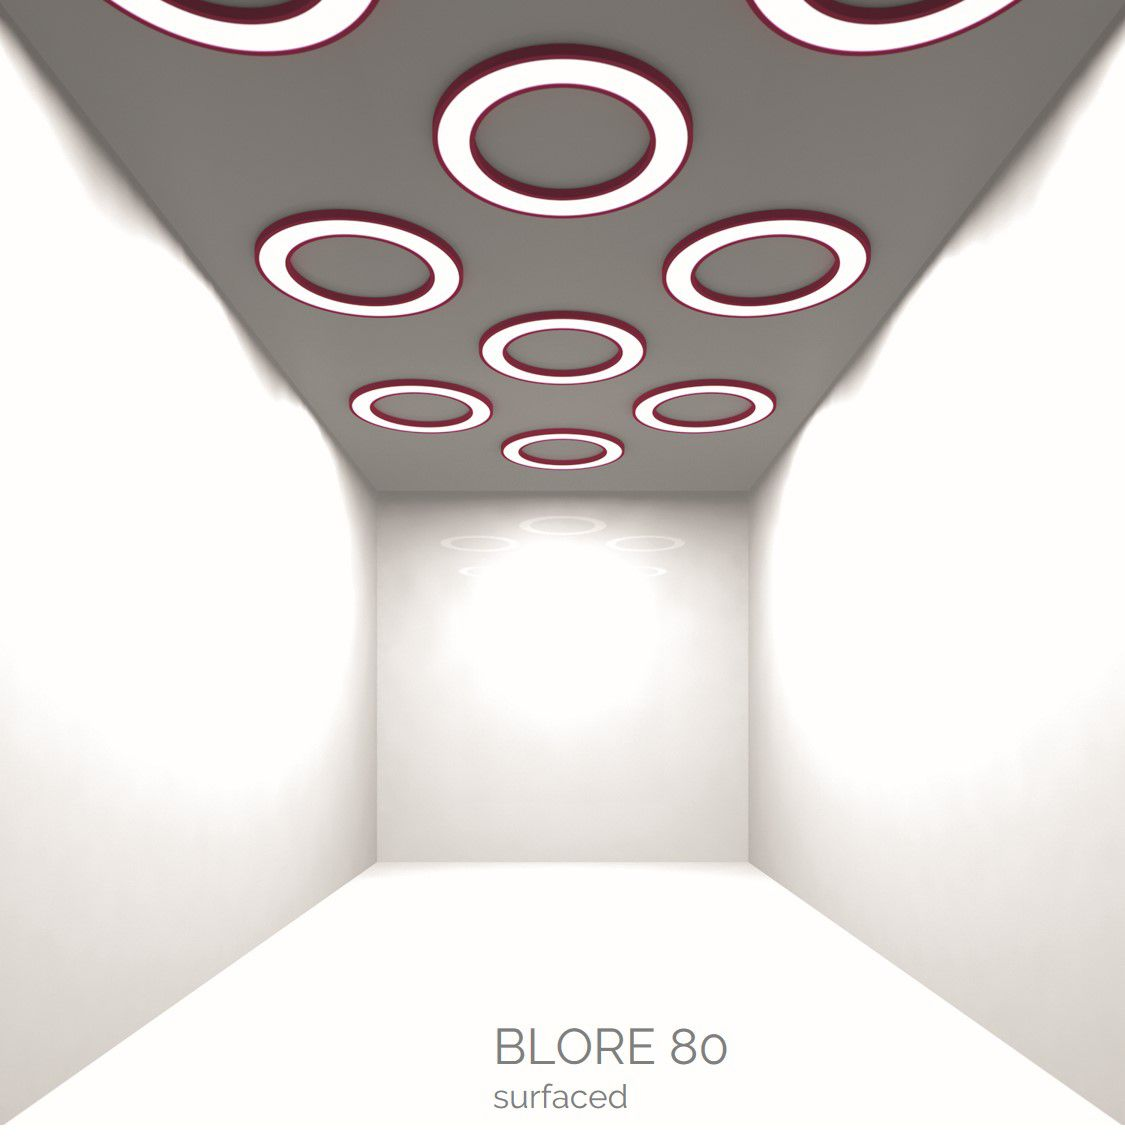 blore 80 opbouw armatuur ring 1200x80mm 3000k 5943lm 70w fix